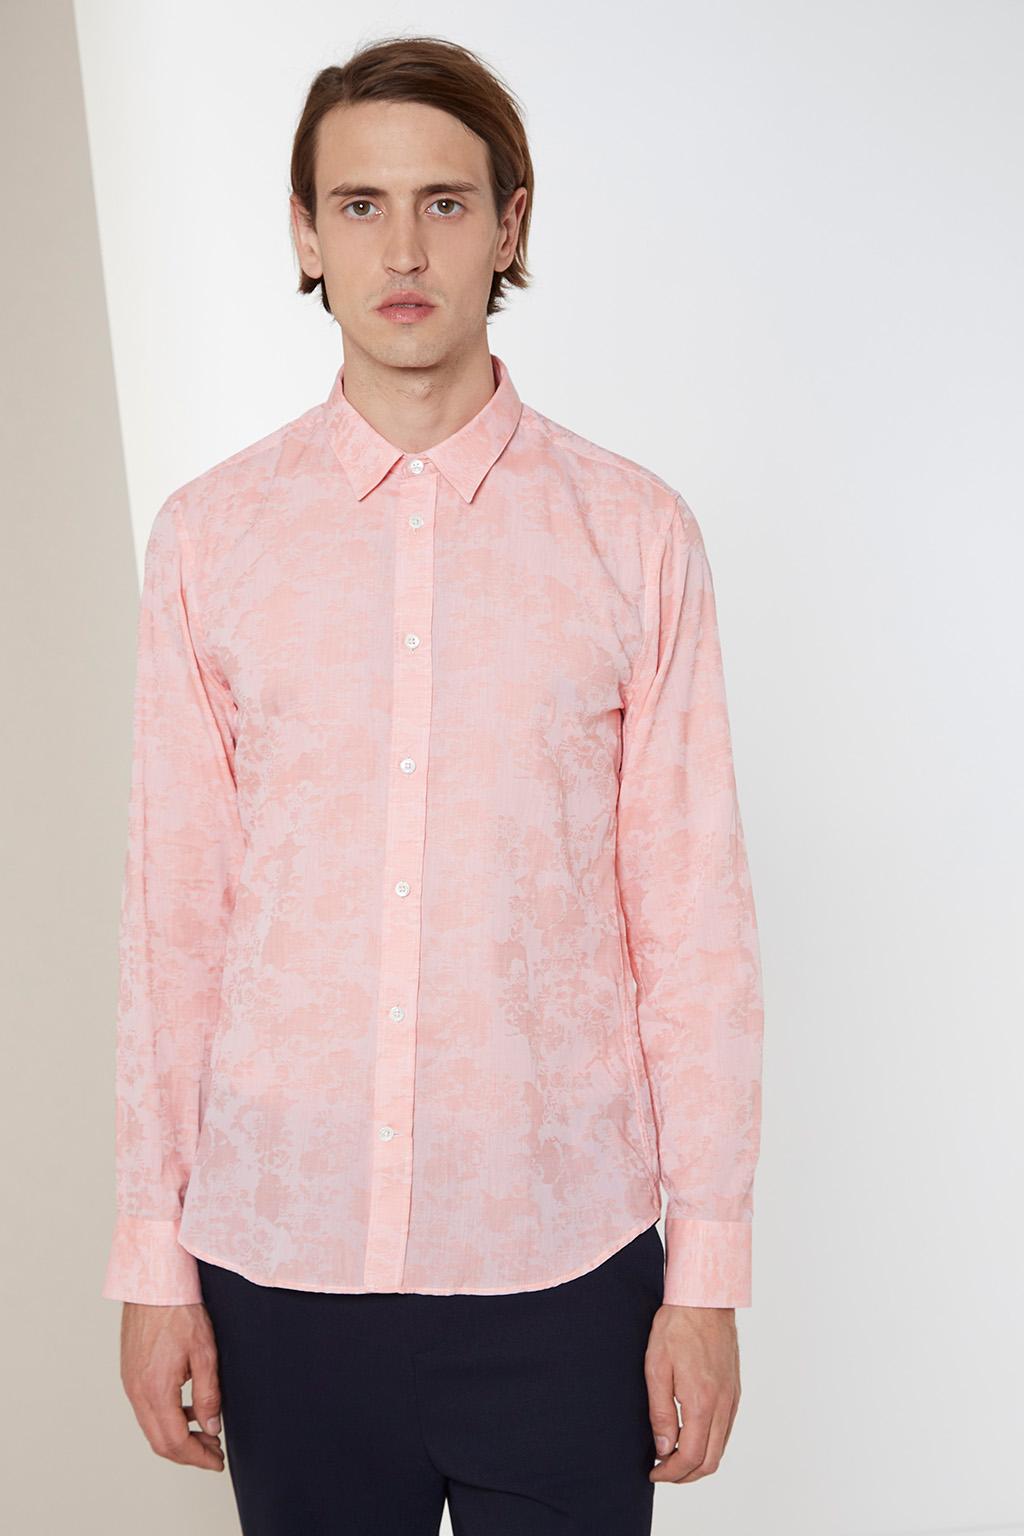 Vente privée Paul and Joe homme chemise rose